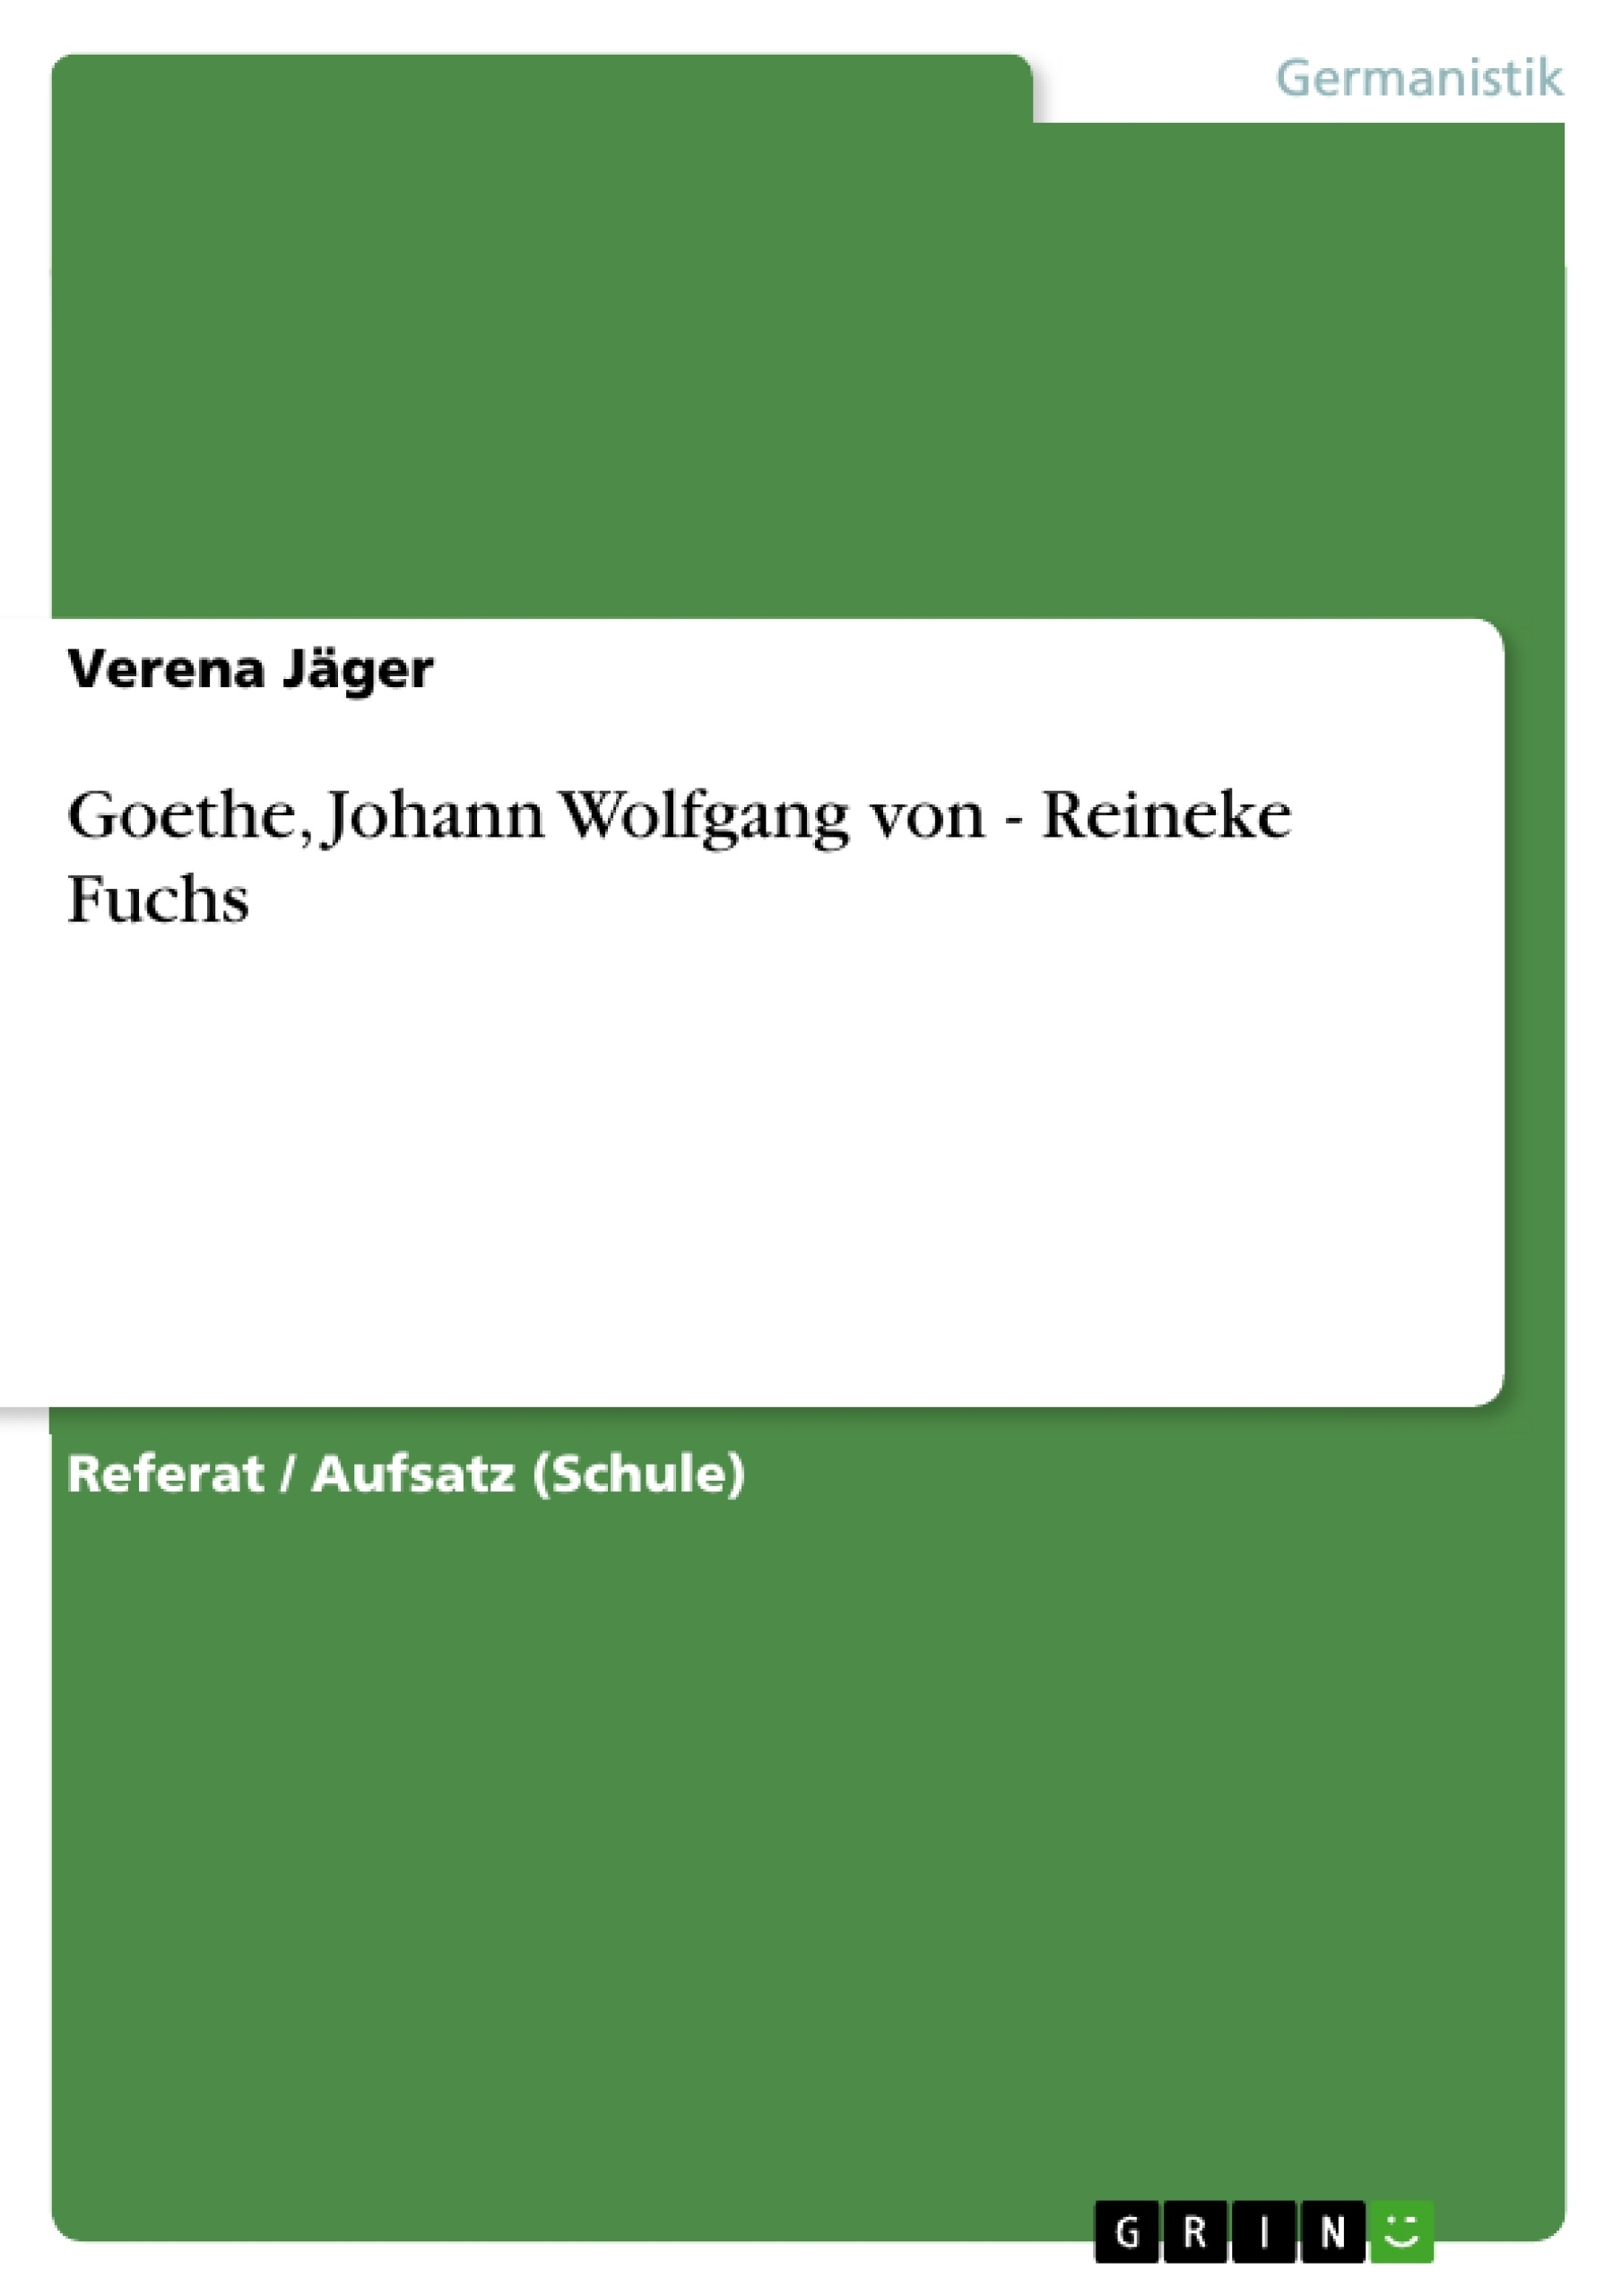 Titel: Goethe, Johann Wolfgang von - Reineke Fuchs